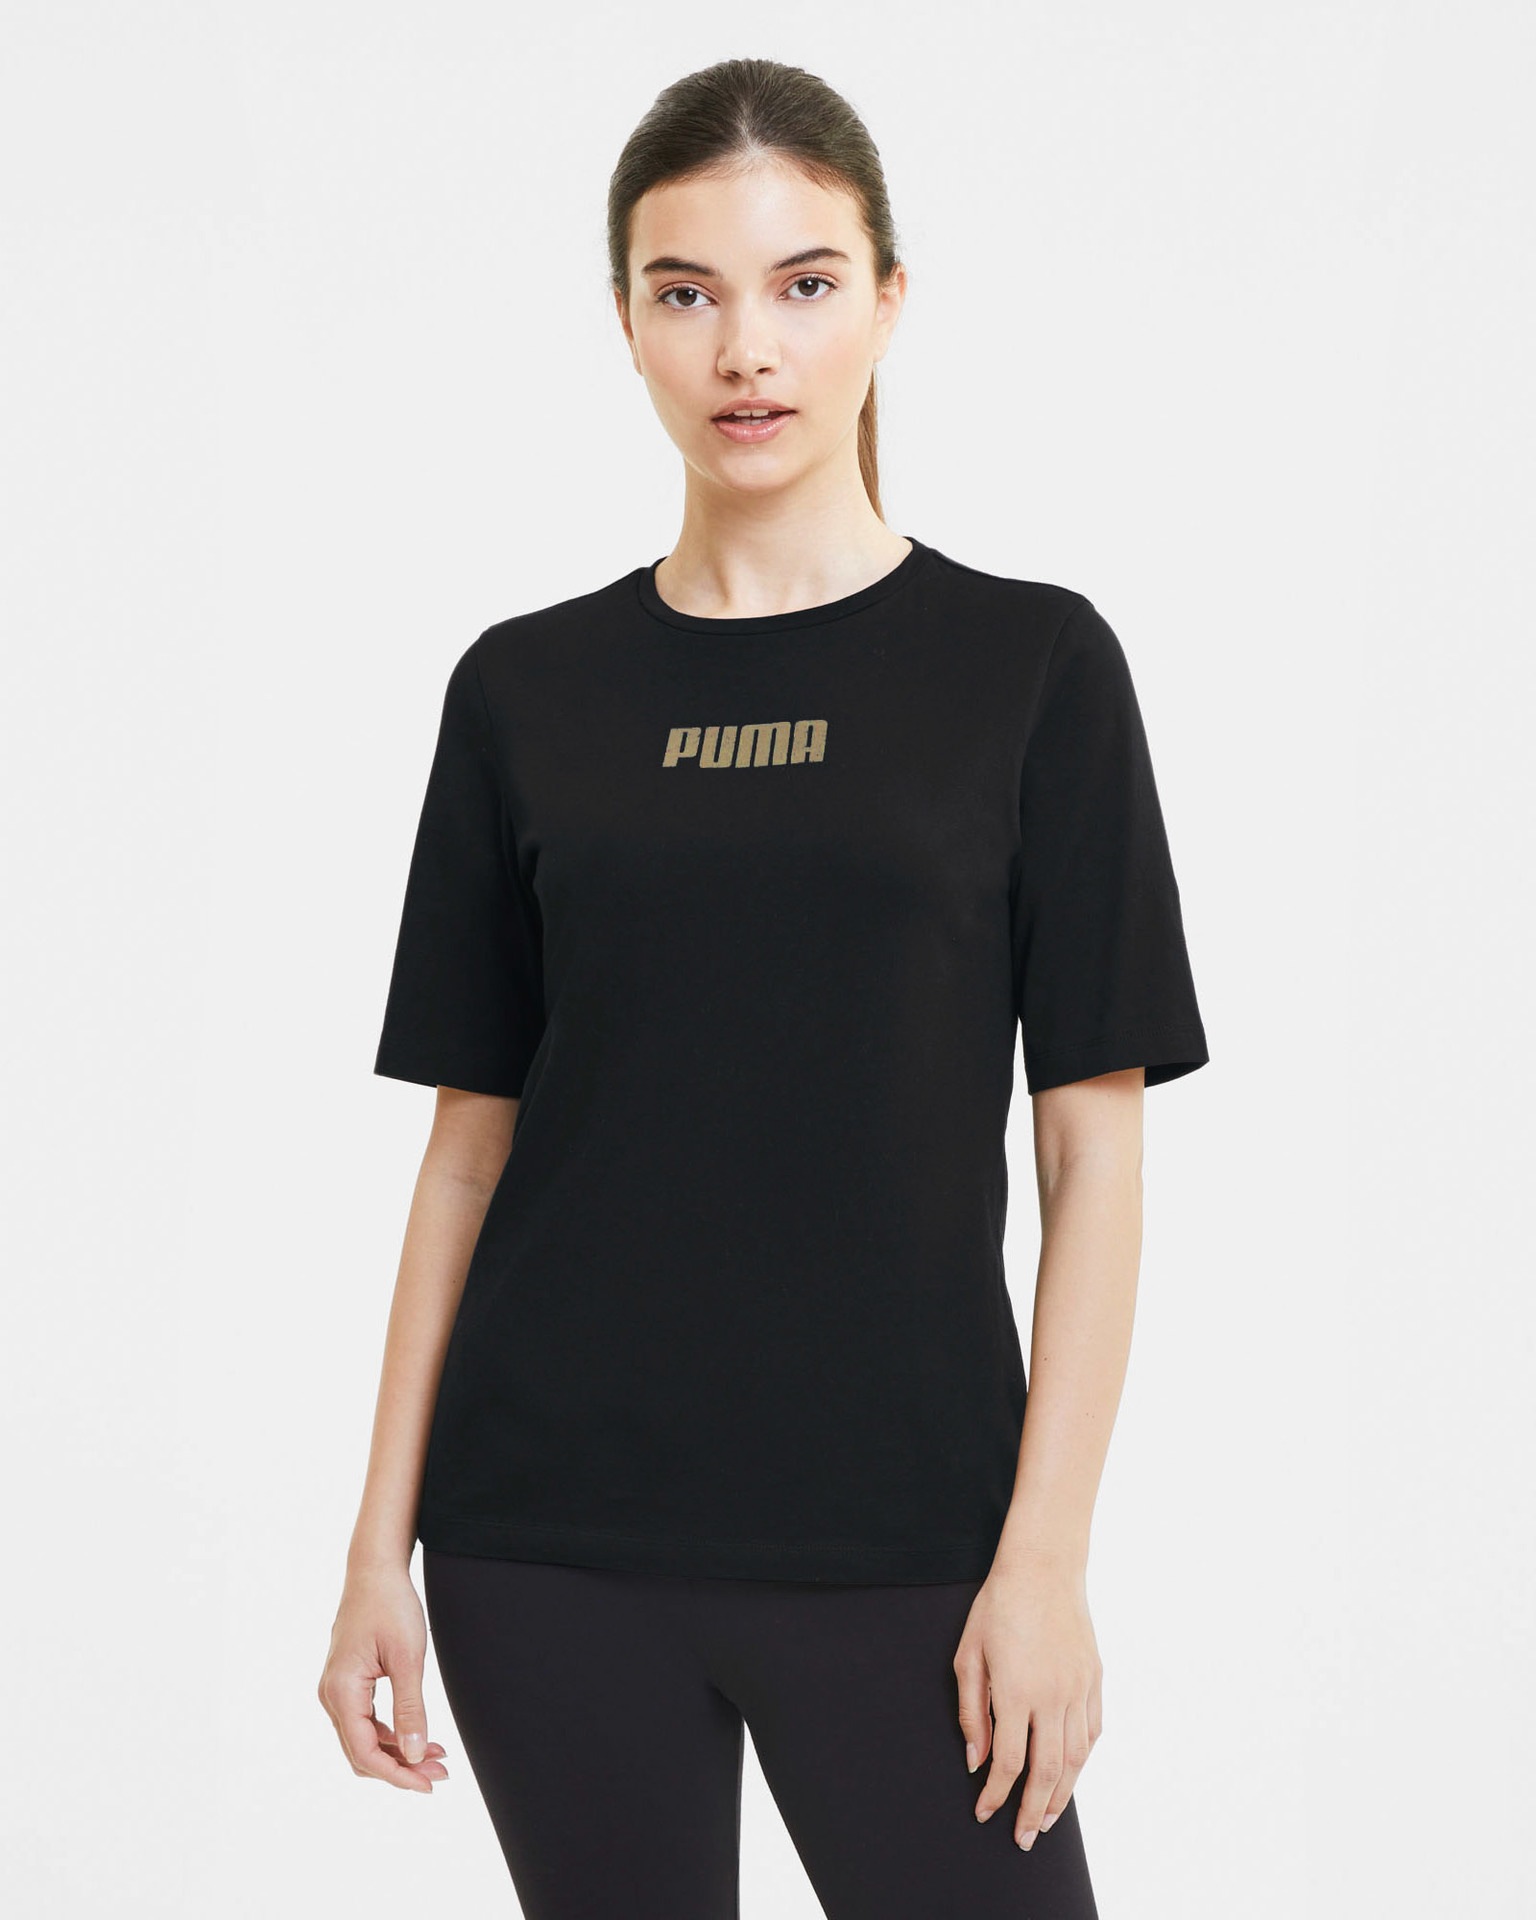 Puma Women's t-shirt black  Basics